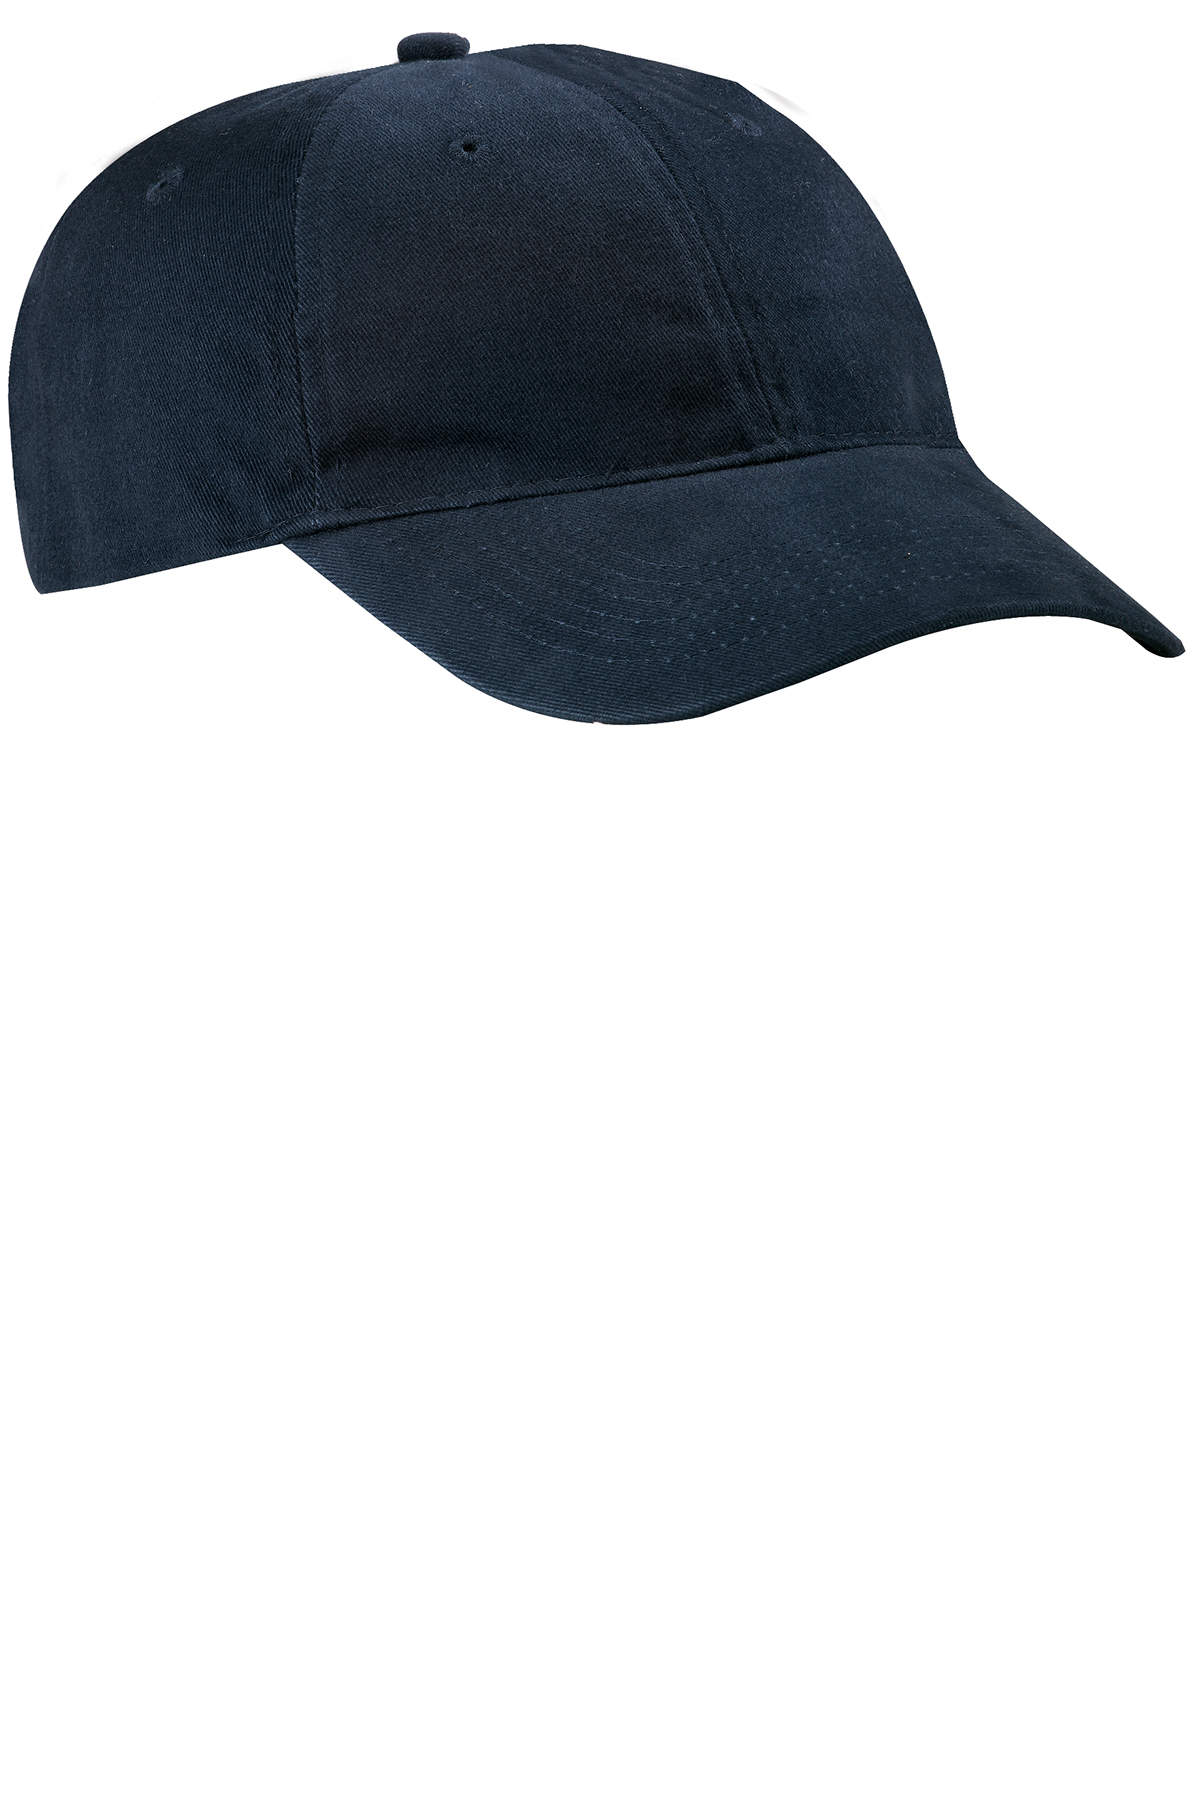 78666b719e4 Port   Company® - Brushed Twill Low Profile Cap